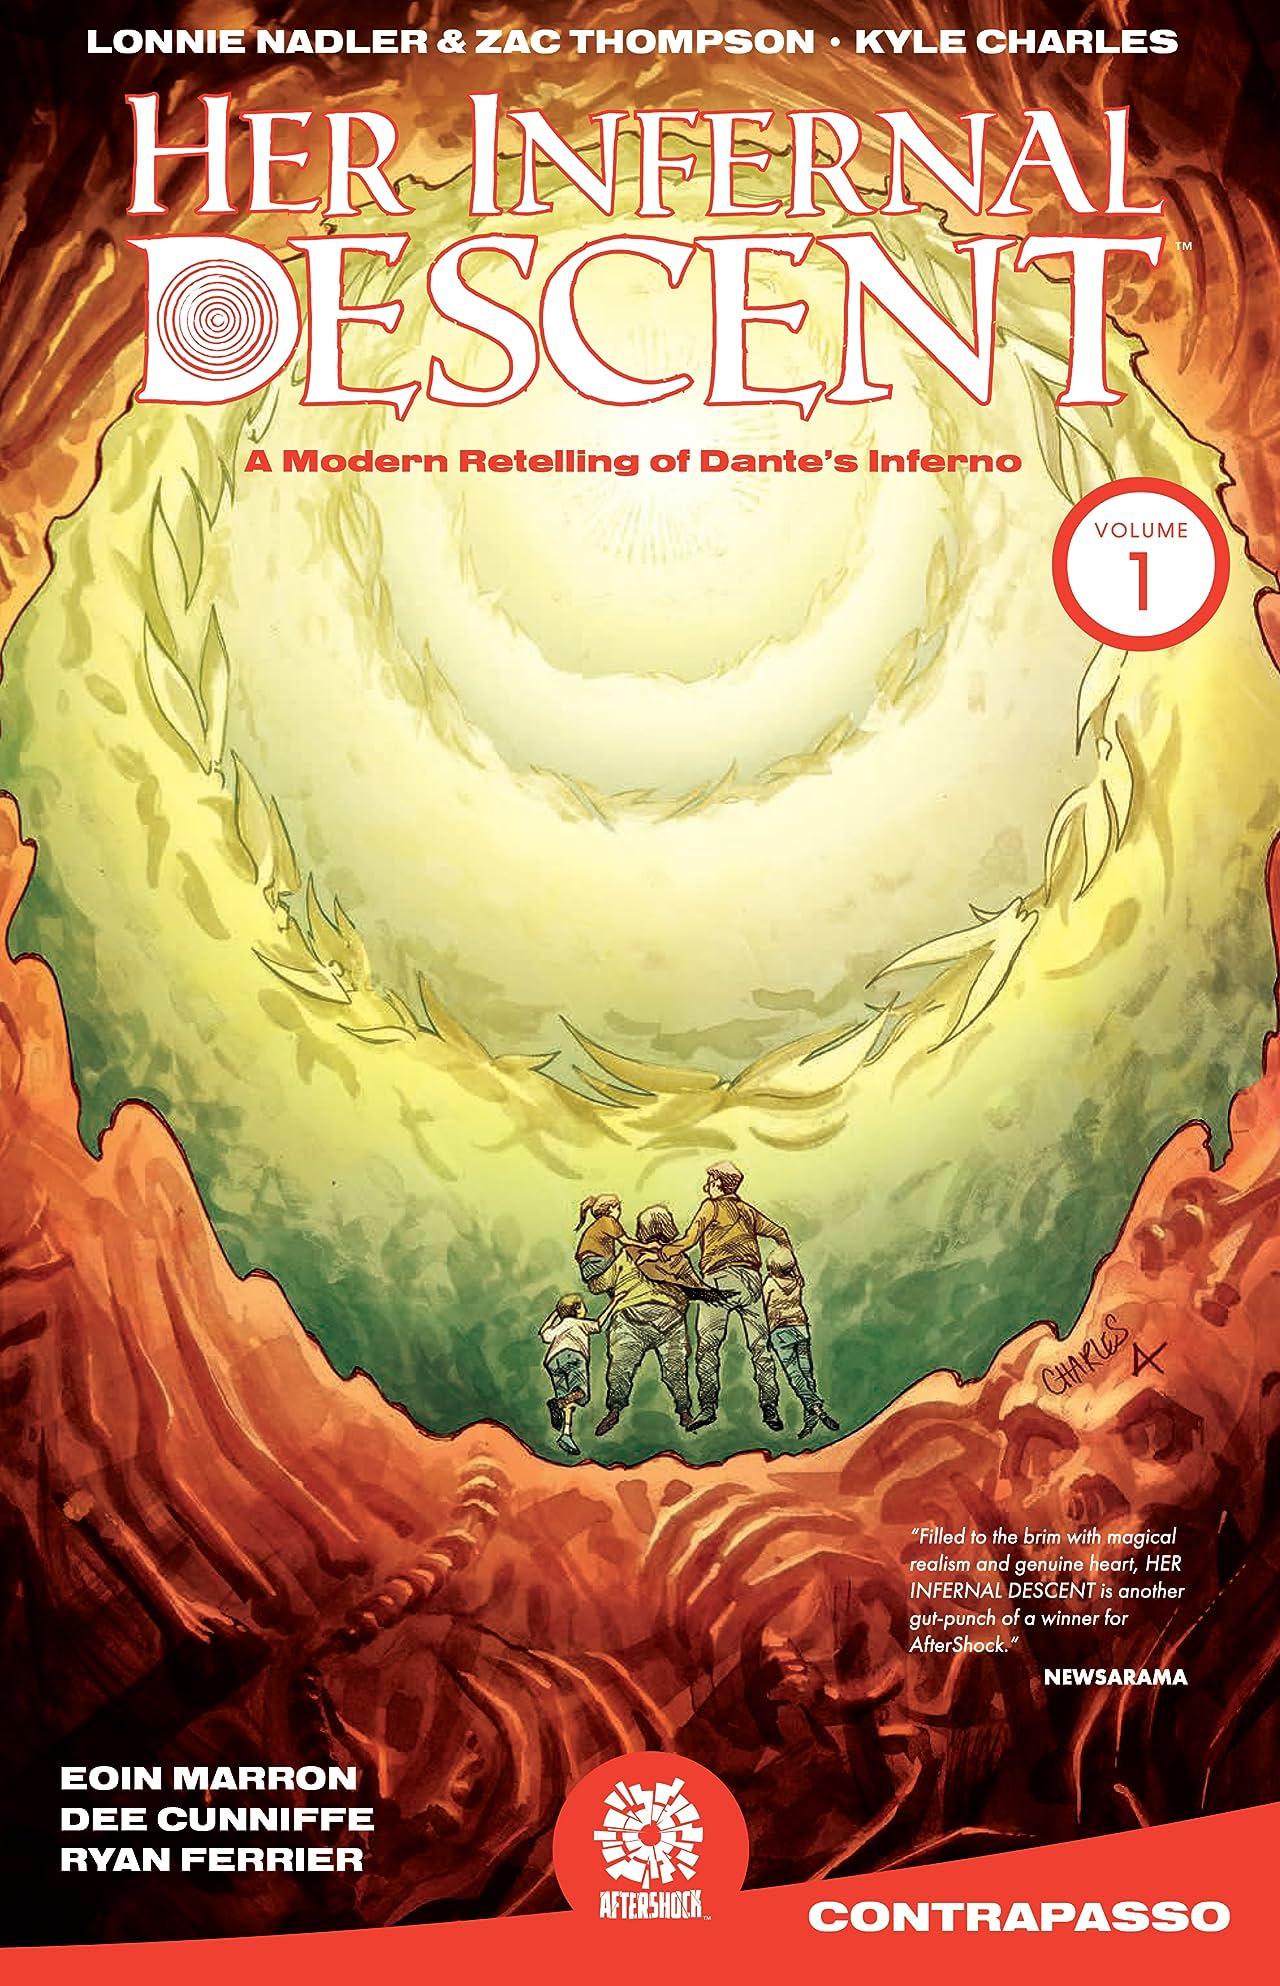 Her Infernal Descent Vol. 1: Contrapasso